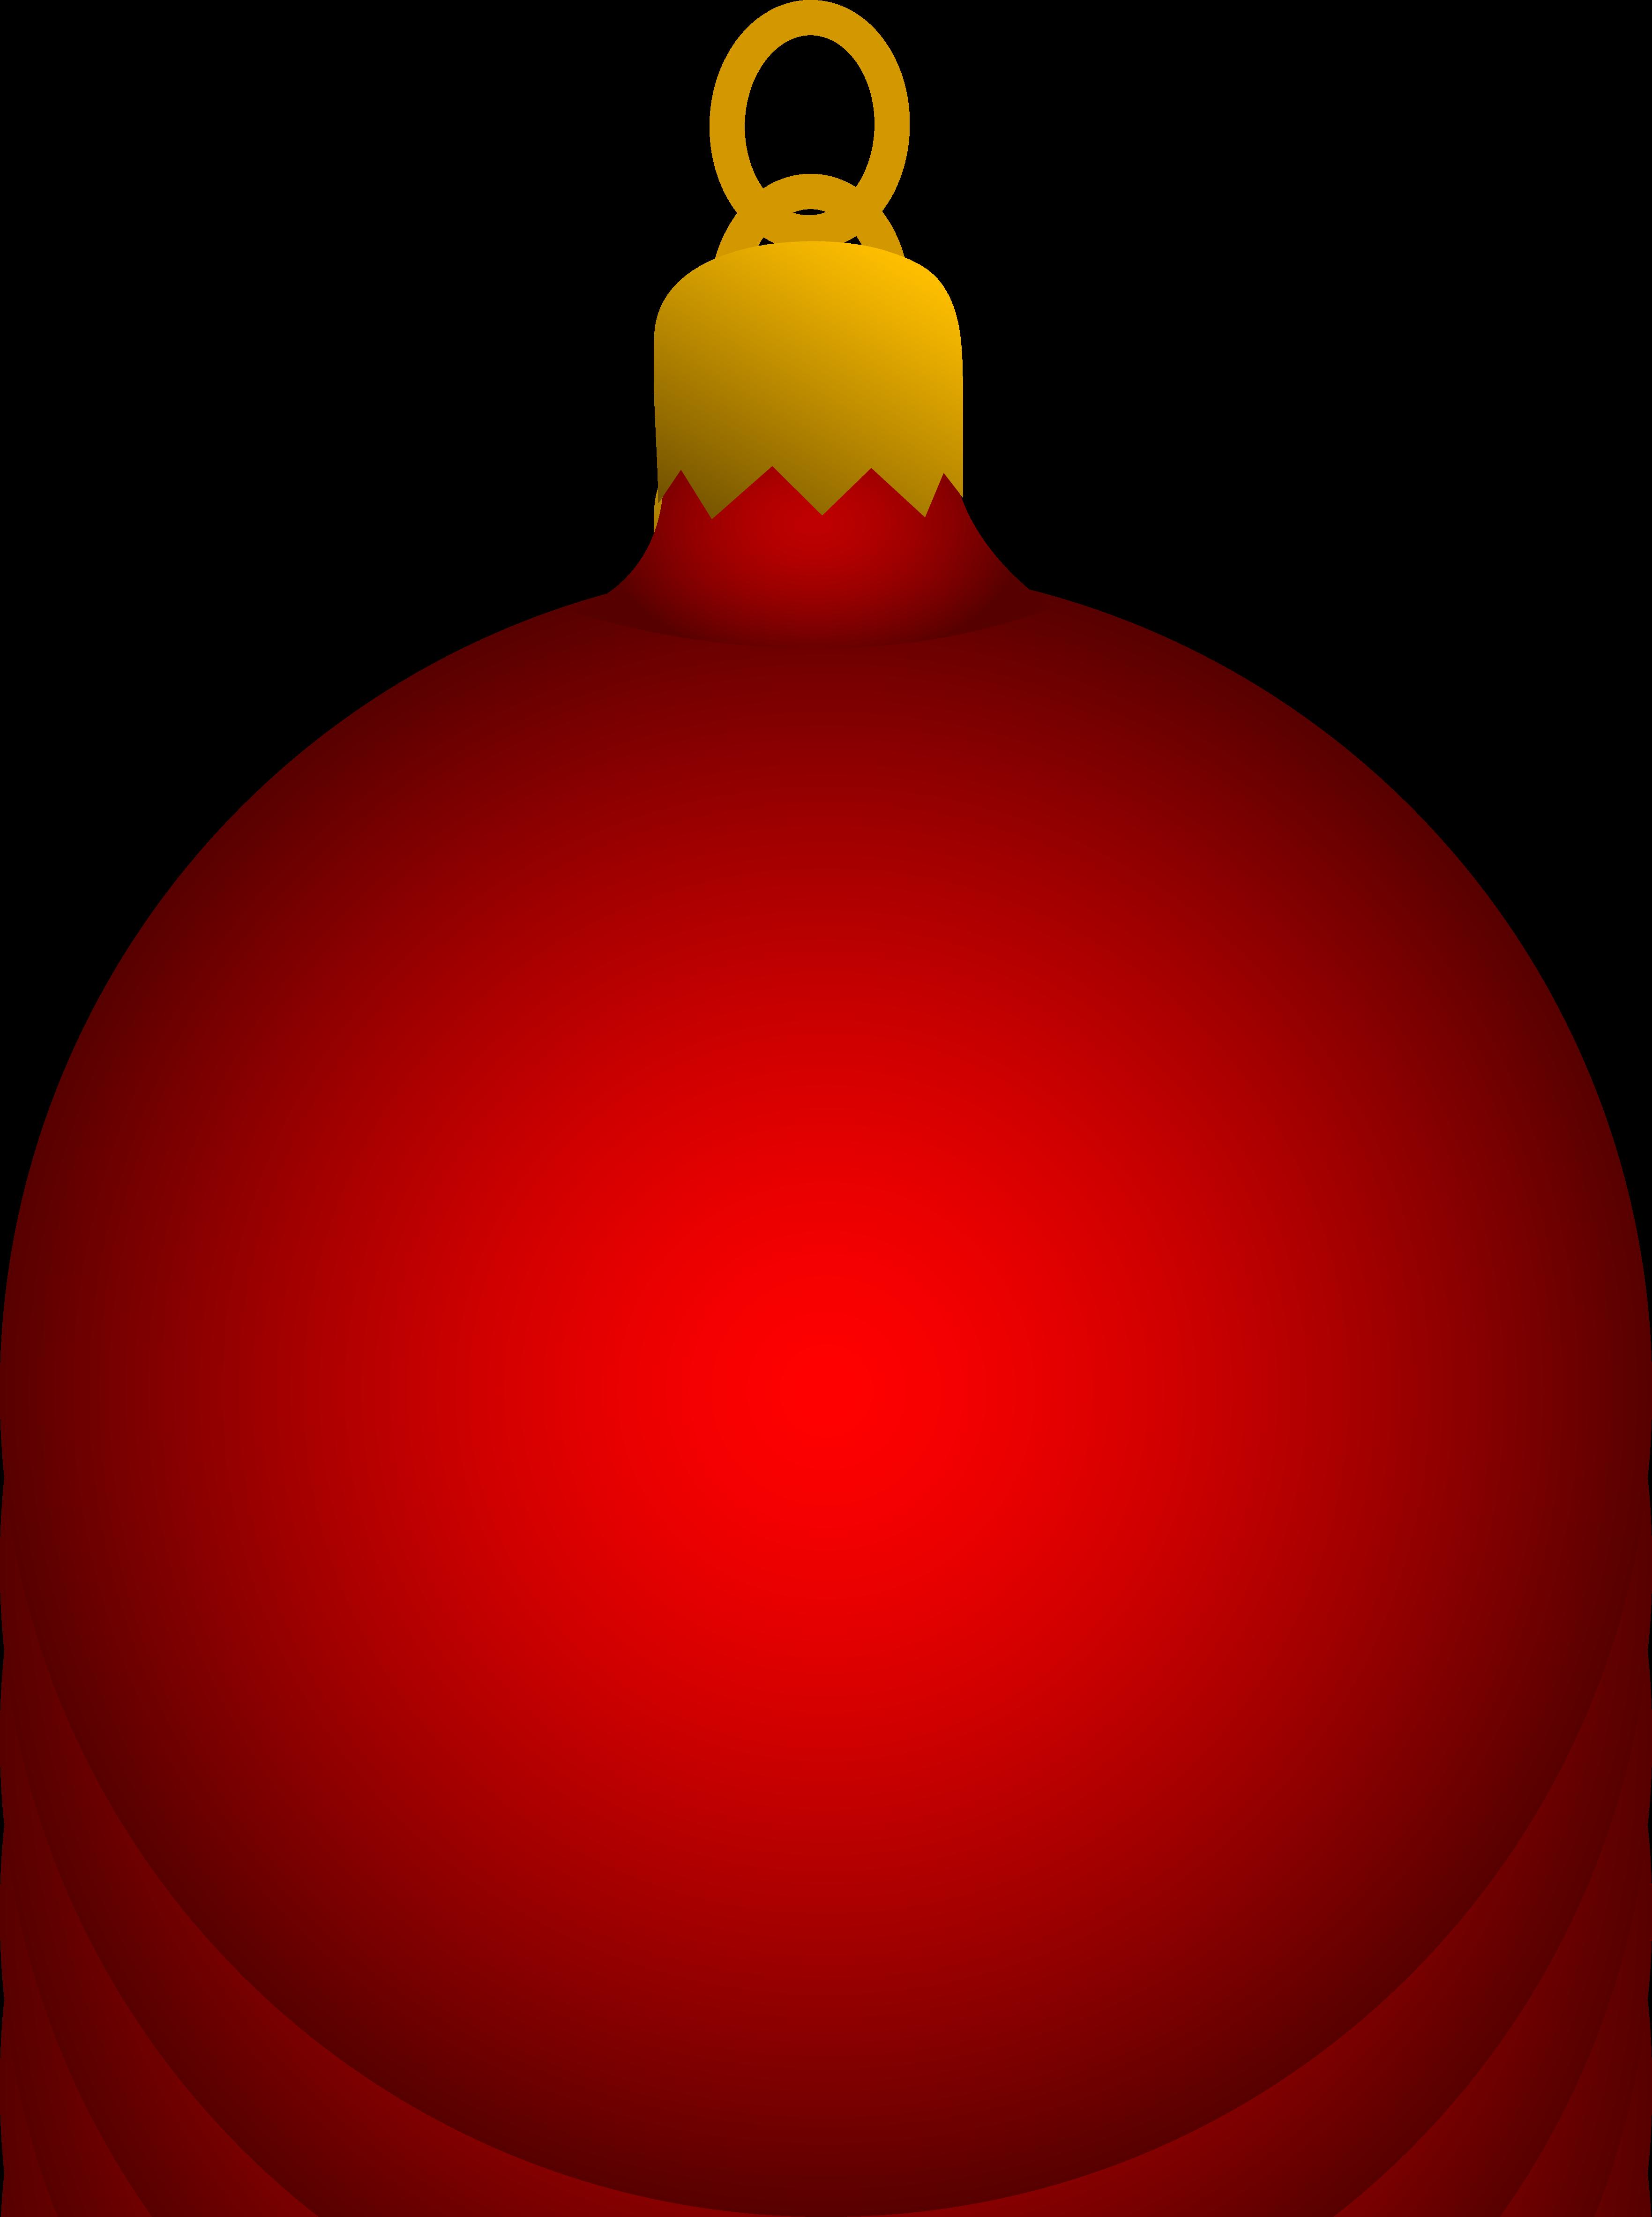 Christmas Ornament Clipart-Clipartlook.com-3525